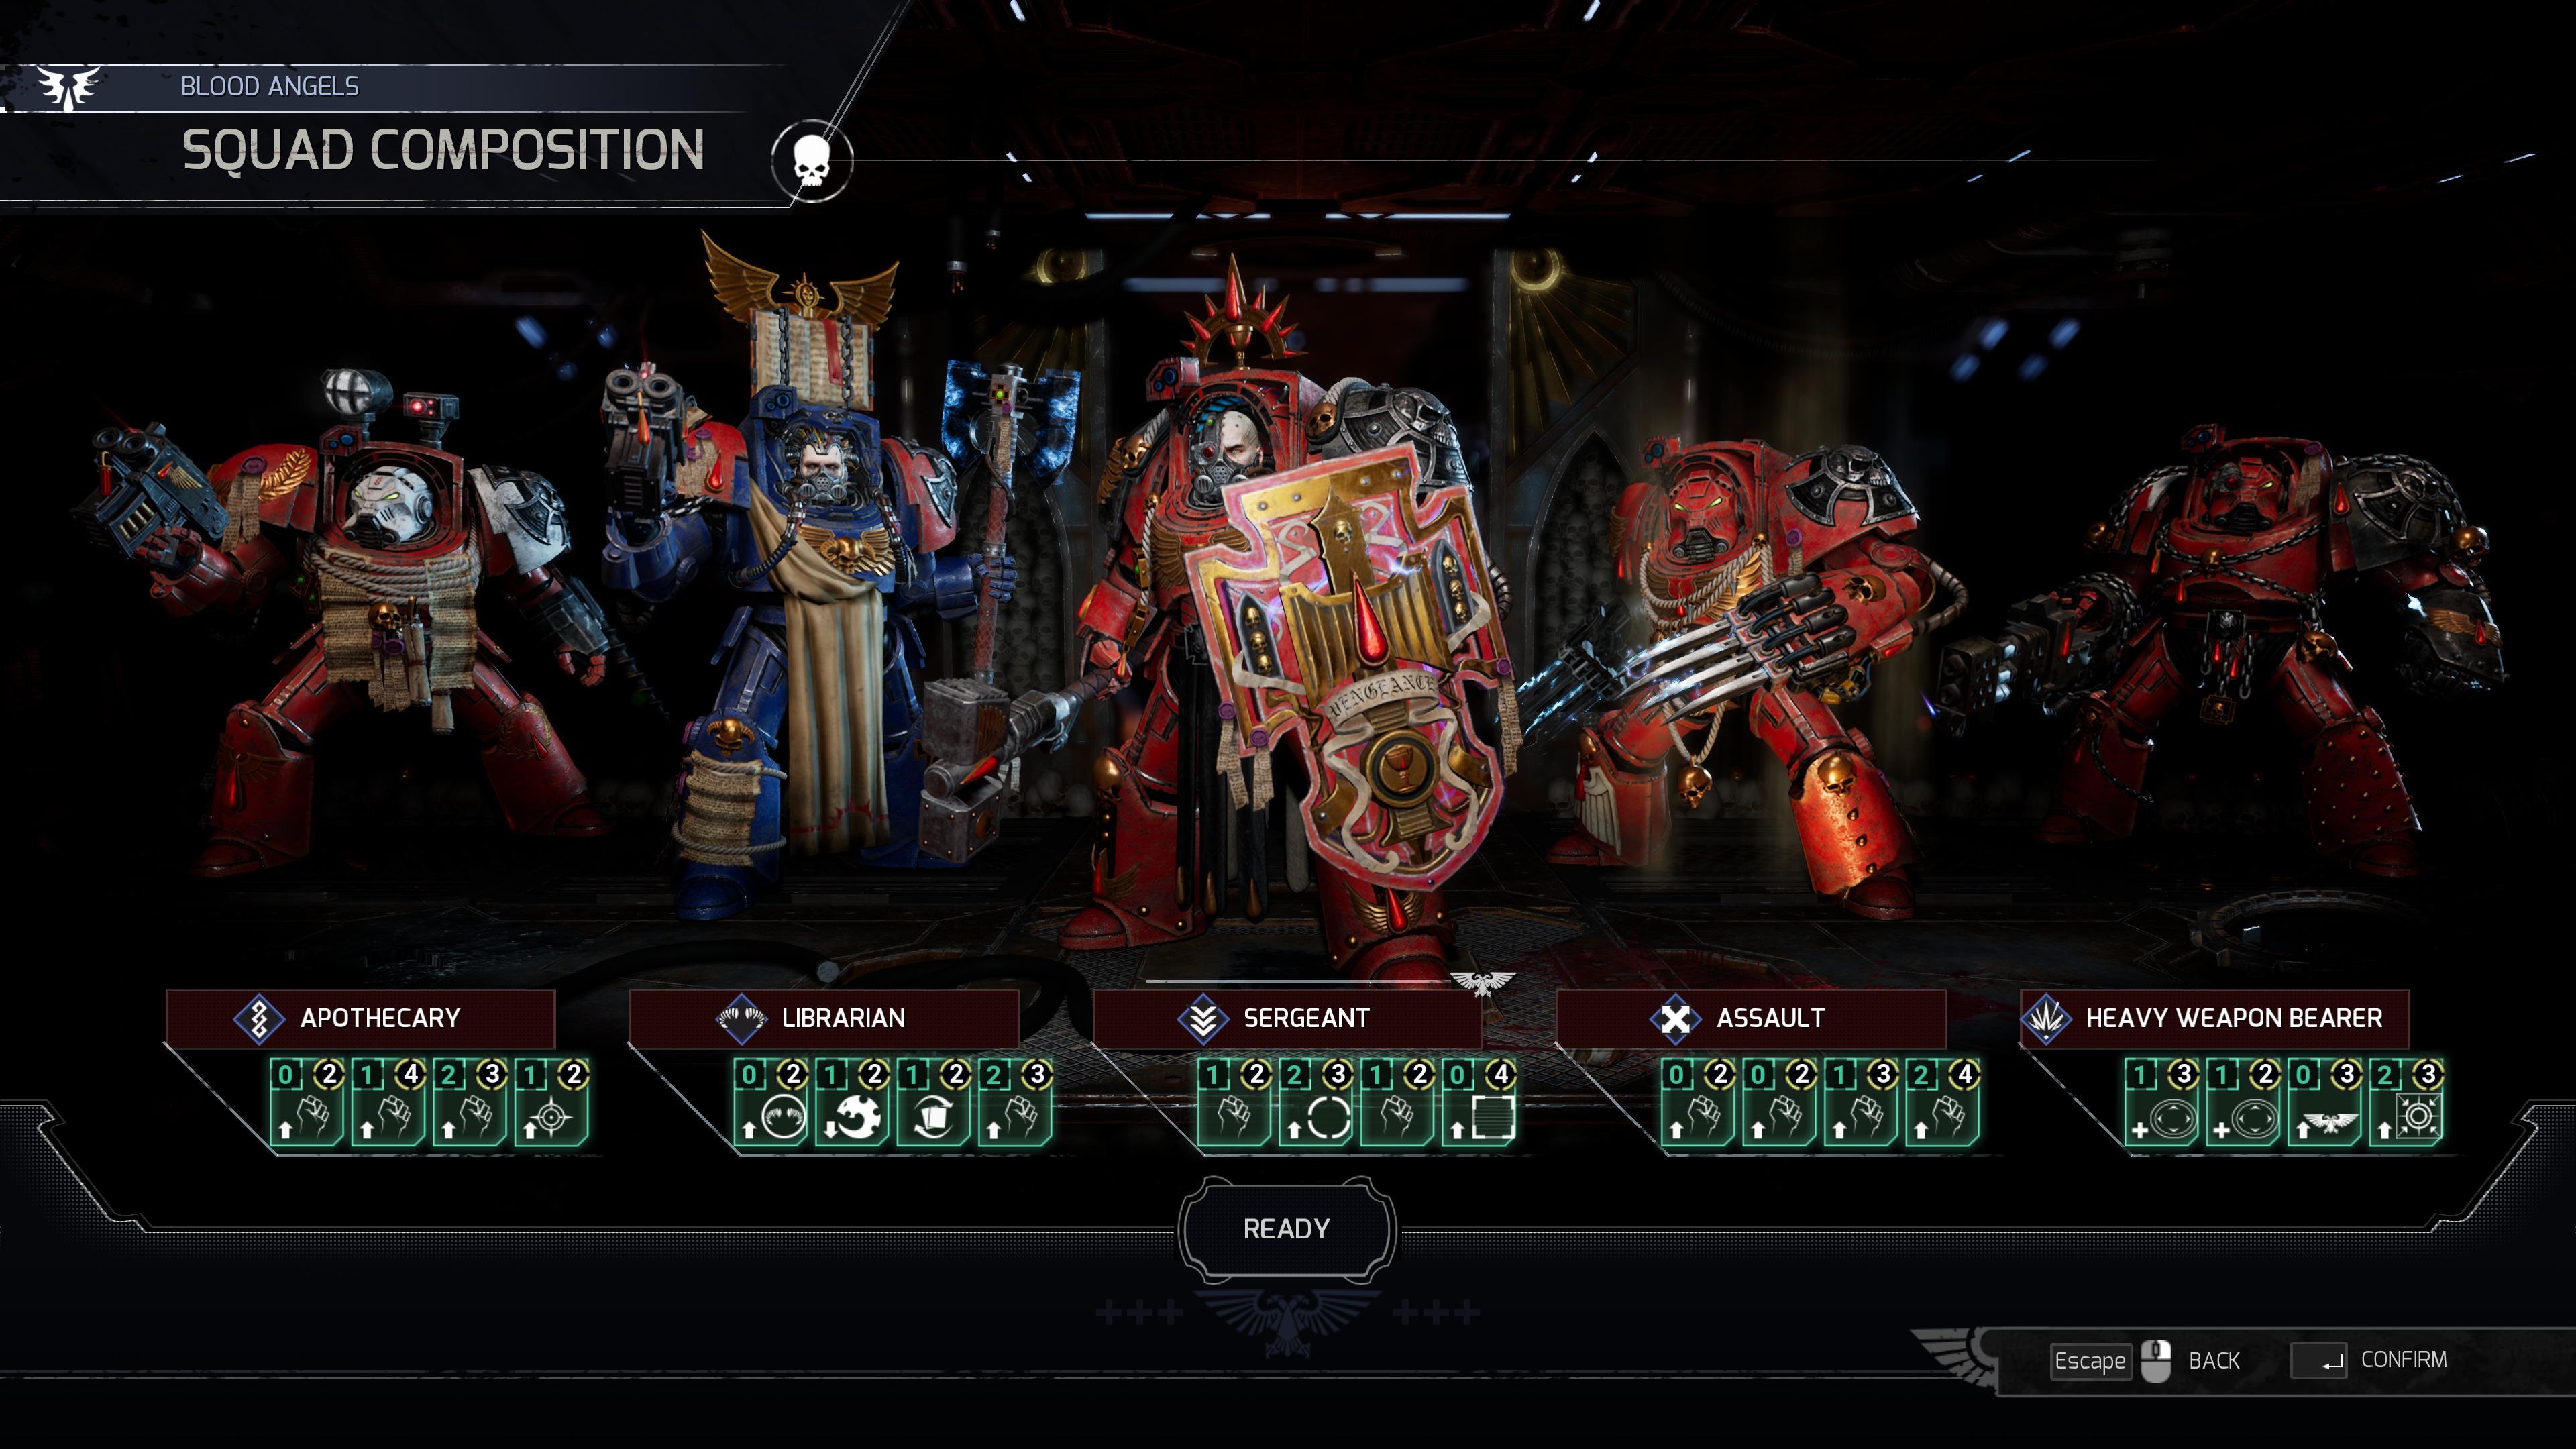 Warhammer 40K games are a dime a dozen, but Space Hulk: Tactics